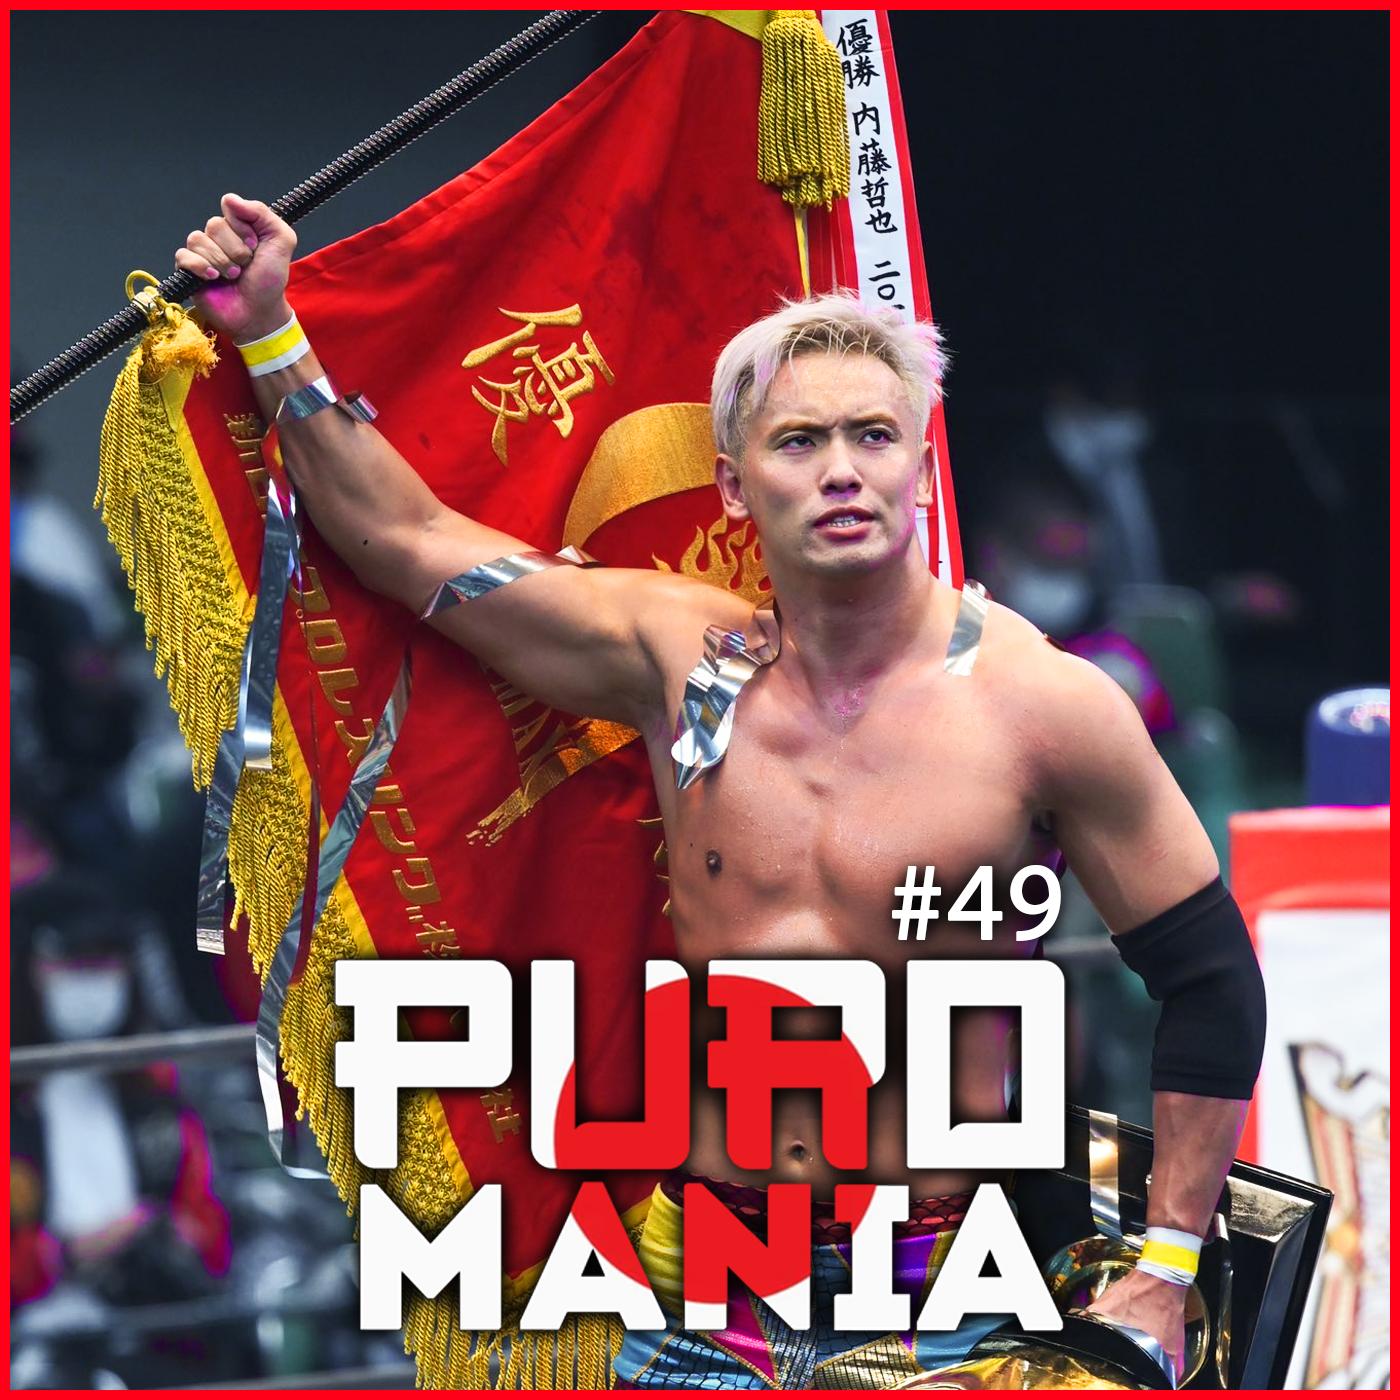 Puromania #49 : LE RETOUR DE SHIBATA 😁 & la blessure d' Ibushi 😭 / Victoire d'OKADA.